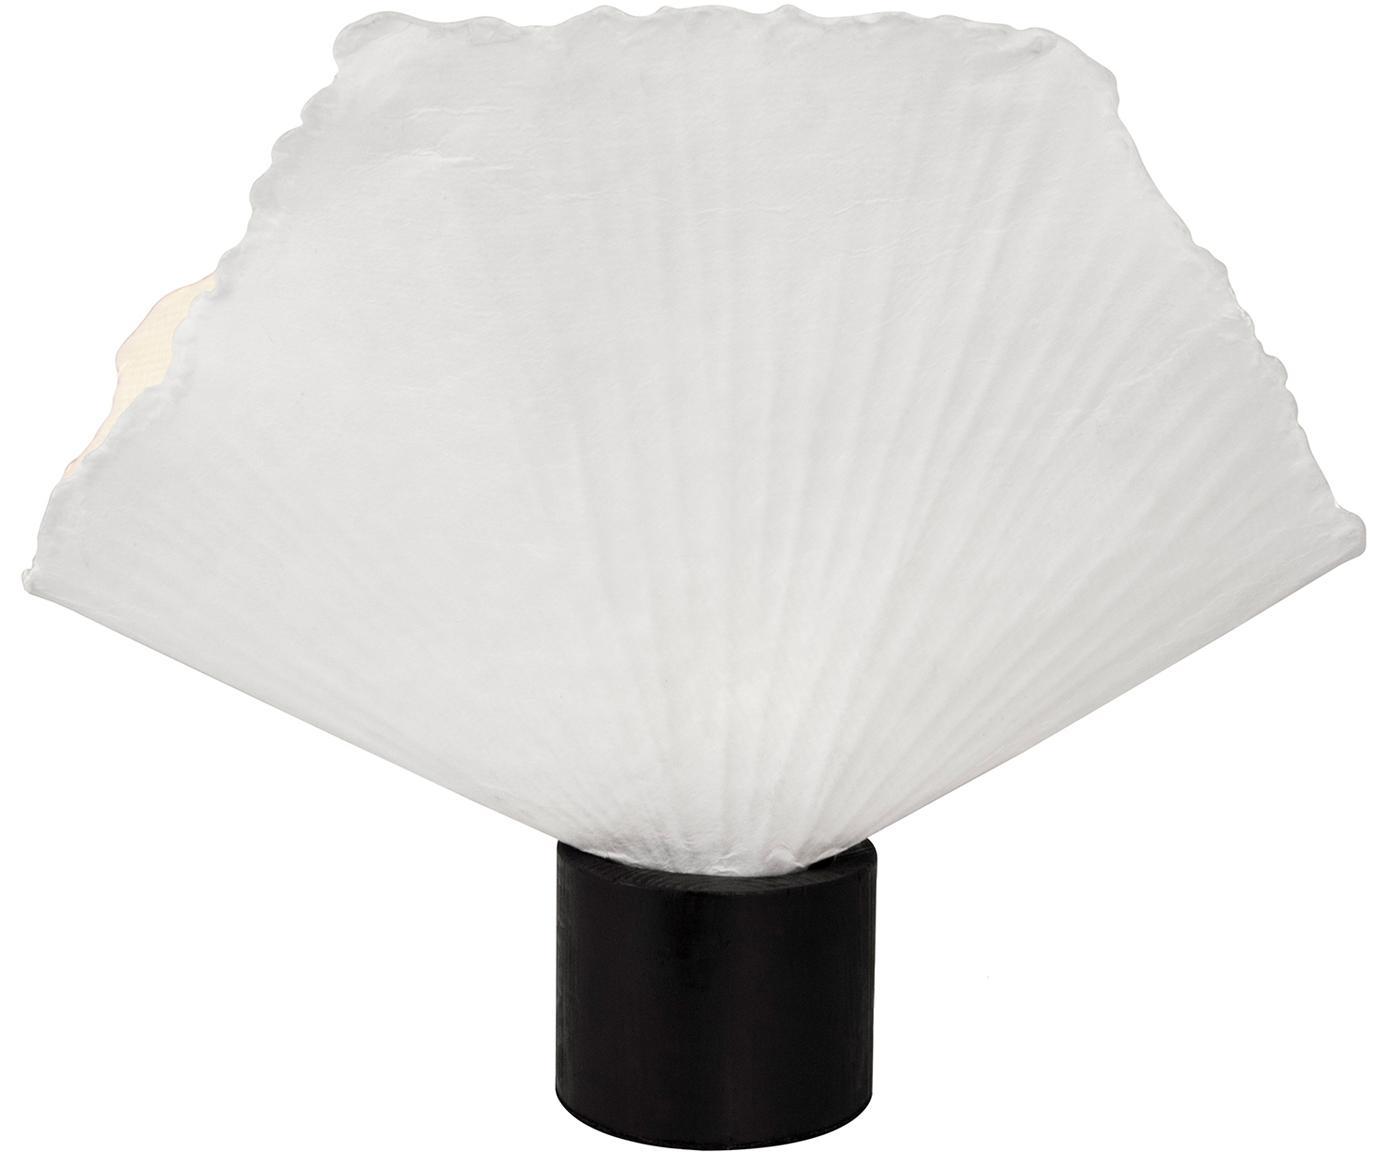 Tafellamp Tropez, Papier, gecoat hout, Wit, zwart, 43 x 35 cm